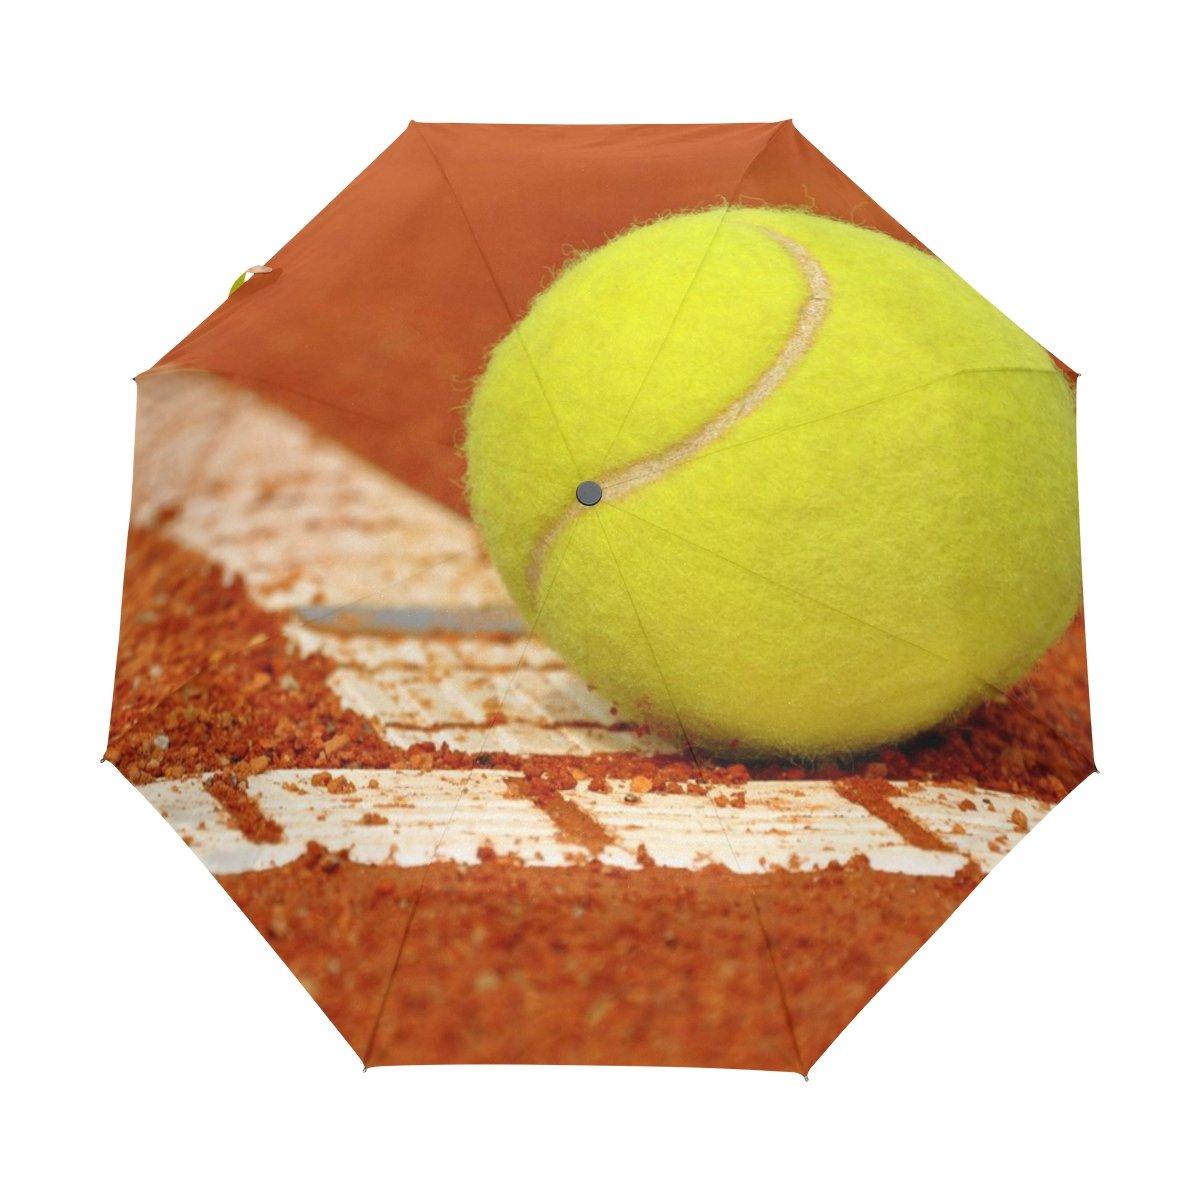 JSTeLテニス防風UV傘Auto Open Close 3折りたたみゴルフStrong Durableコンパクト旅行太陽傘、ポータブル軽量簡単キャリー   B06Y29W45T